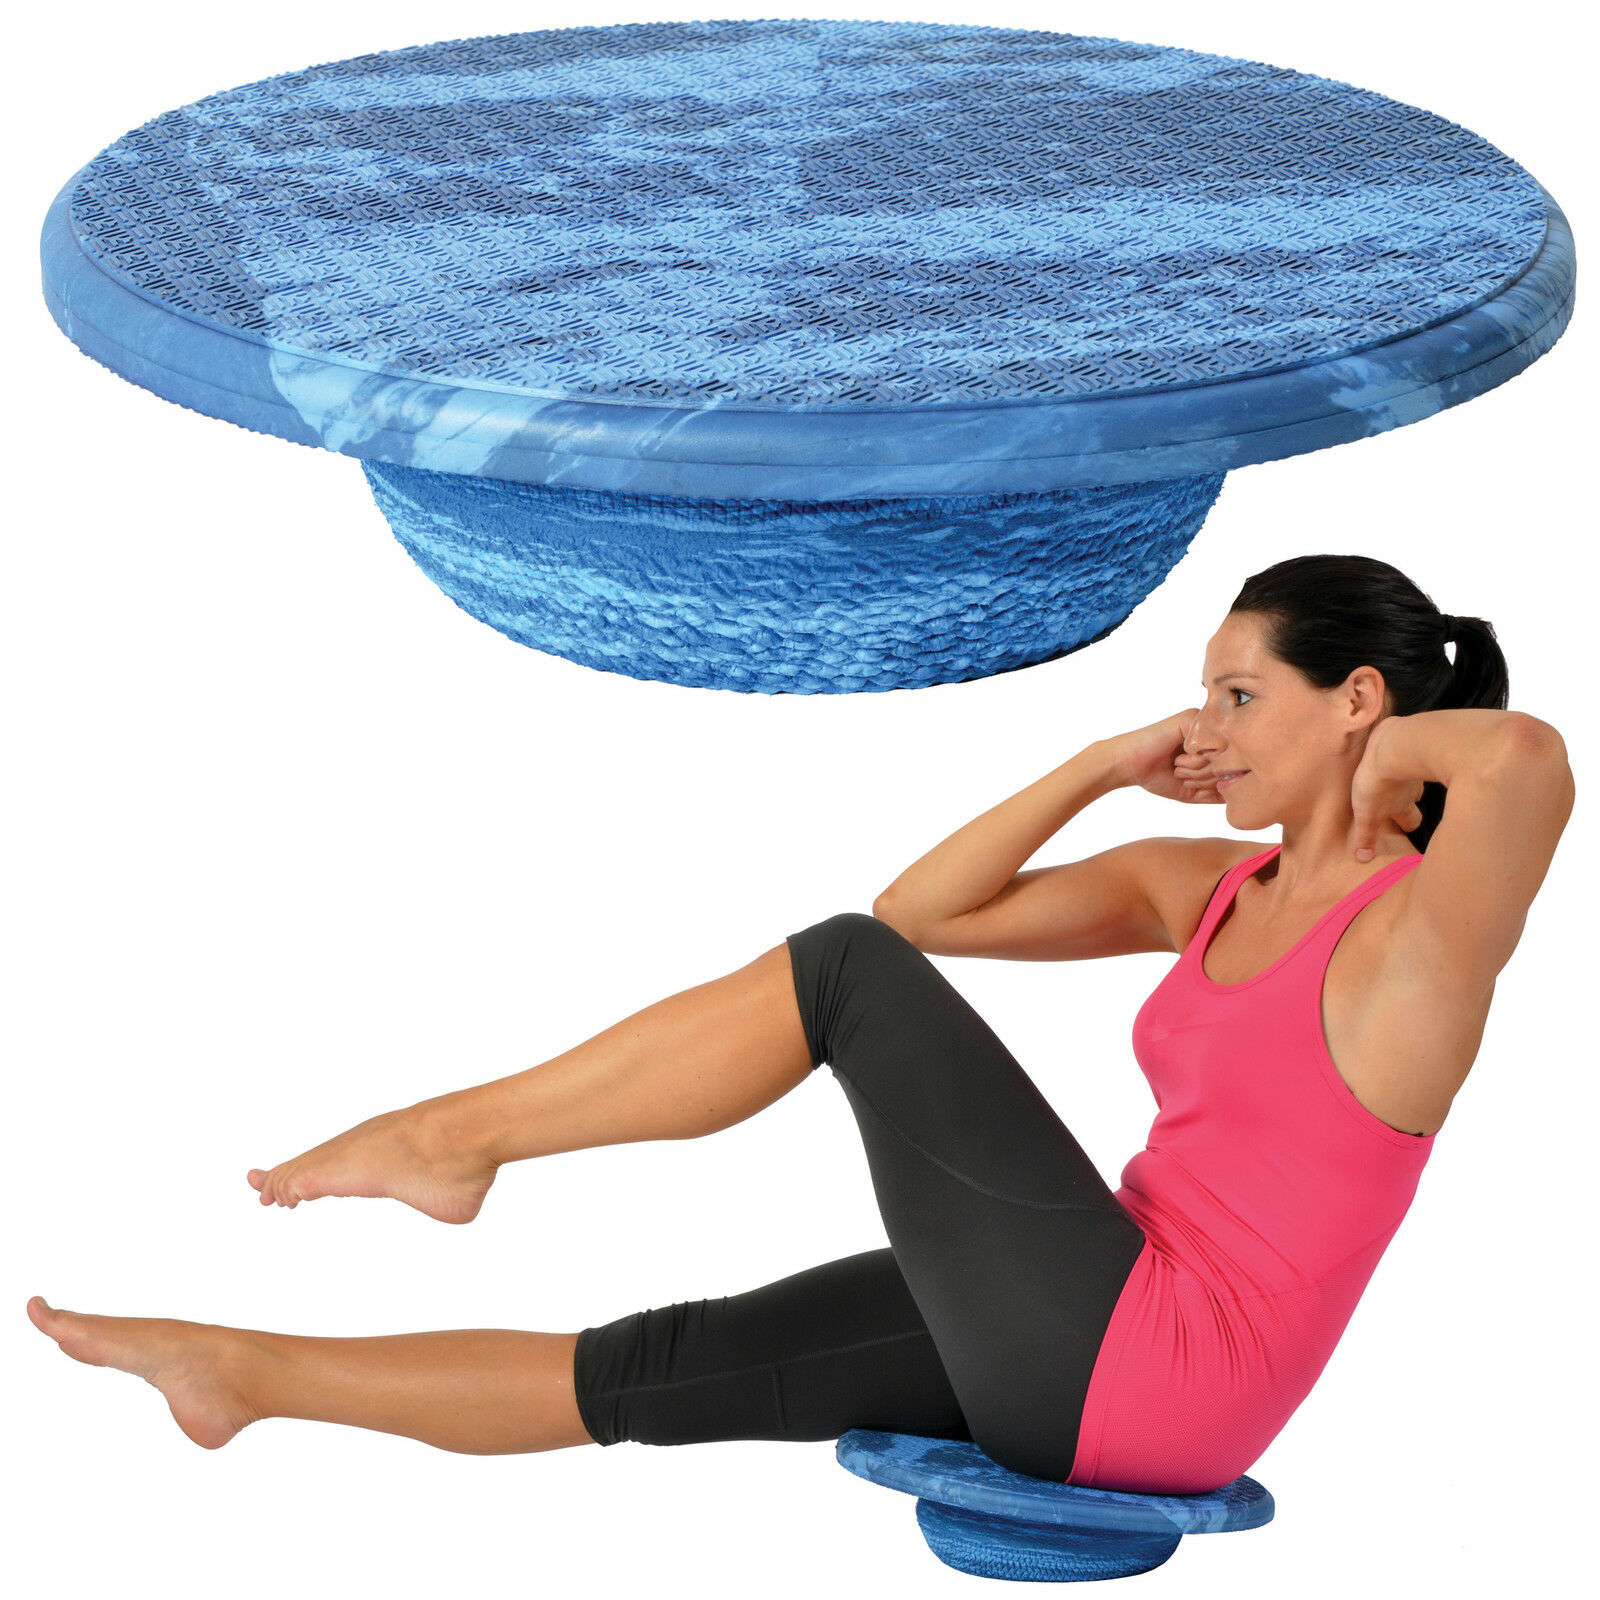 Msd EKILIBRE INTERMEDIA tavola equilibrio propriocezione postura INTERMEDIATE